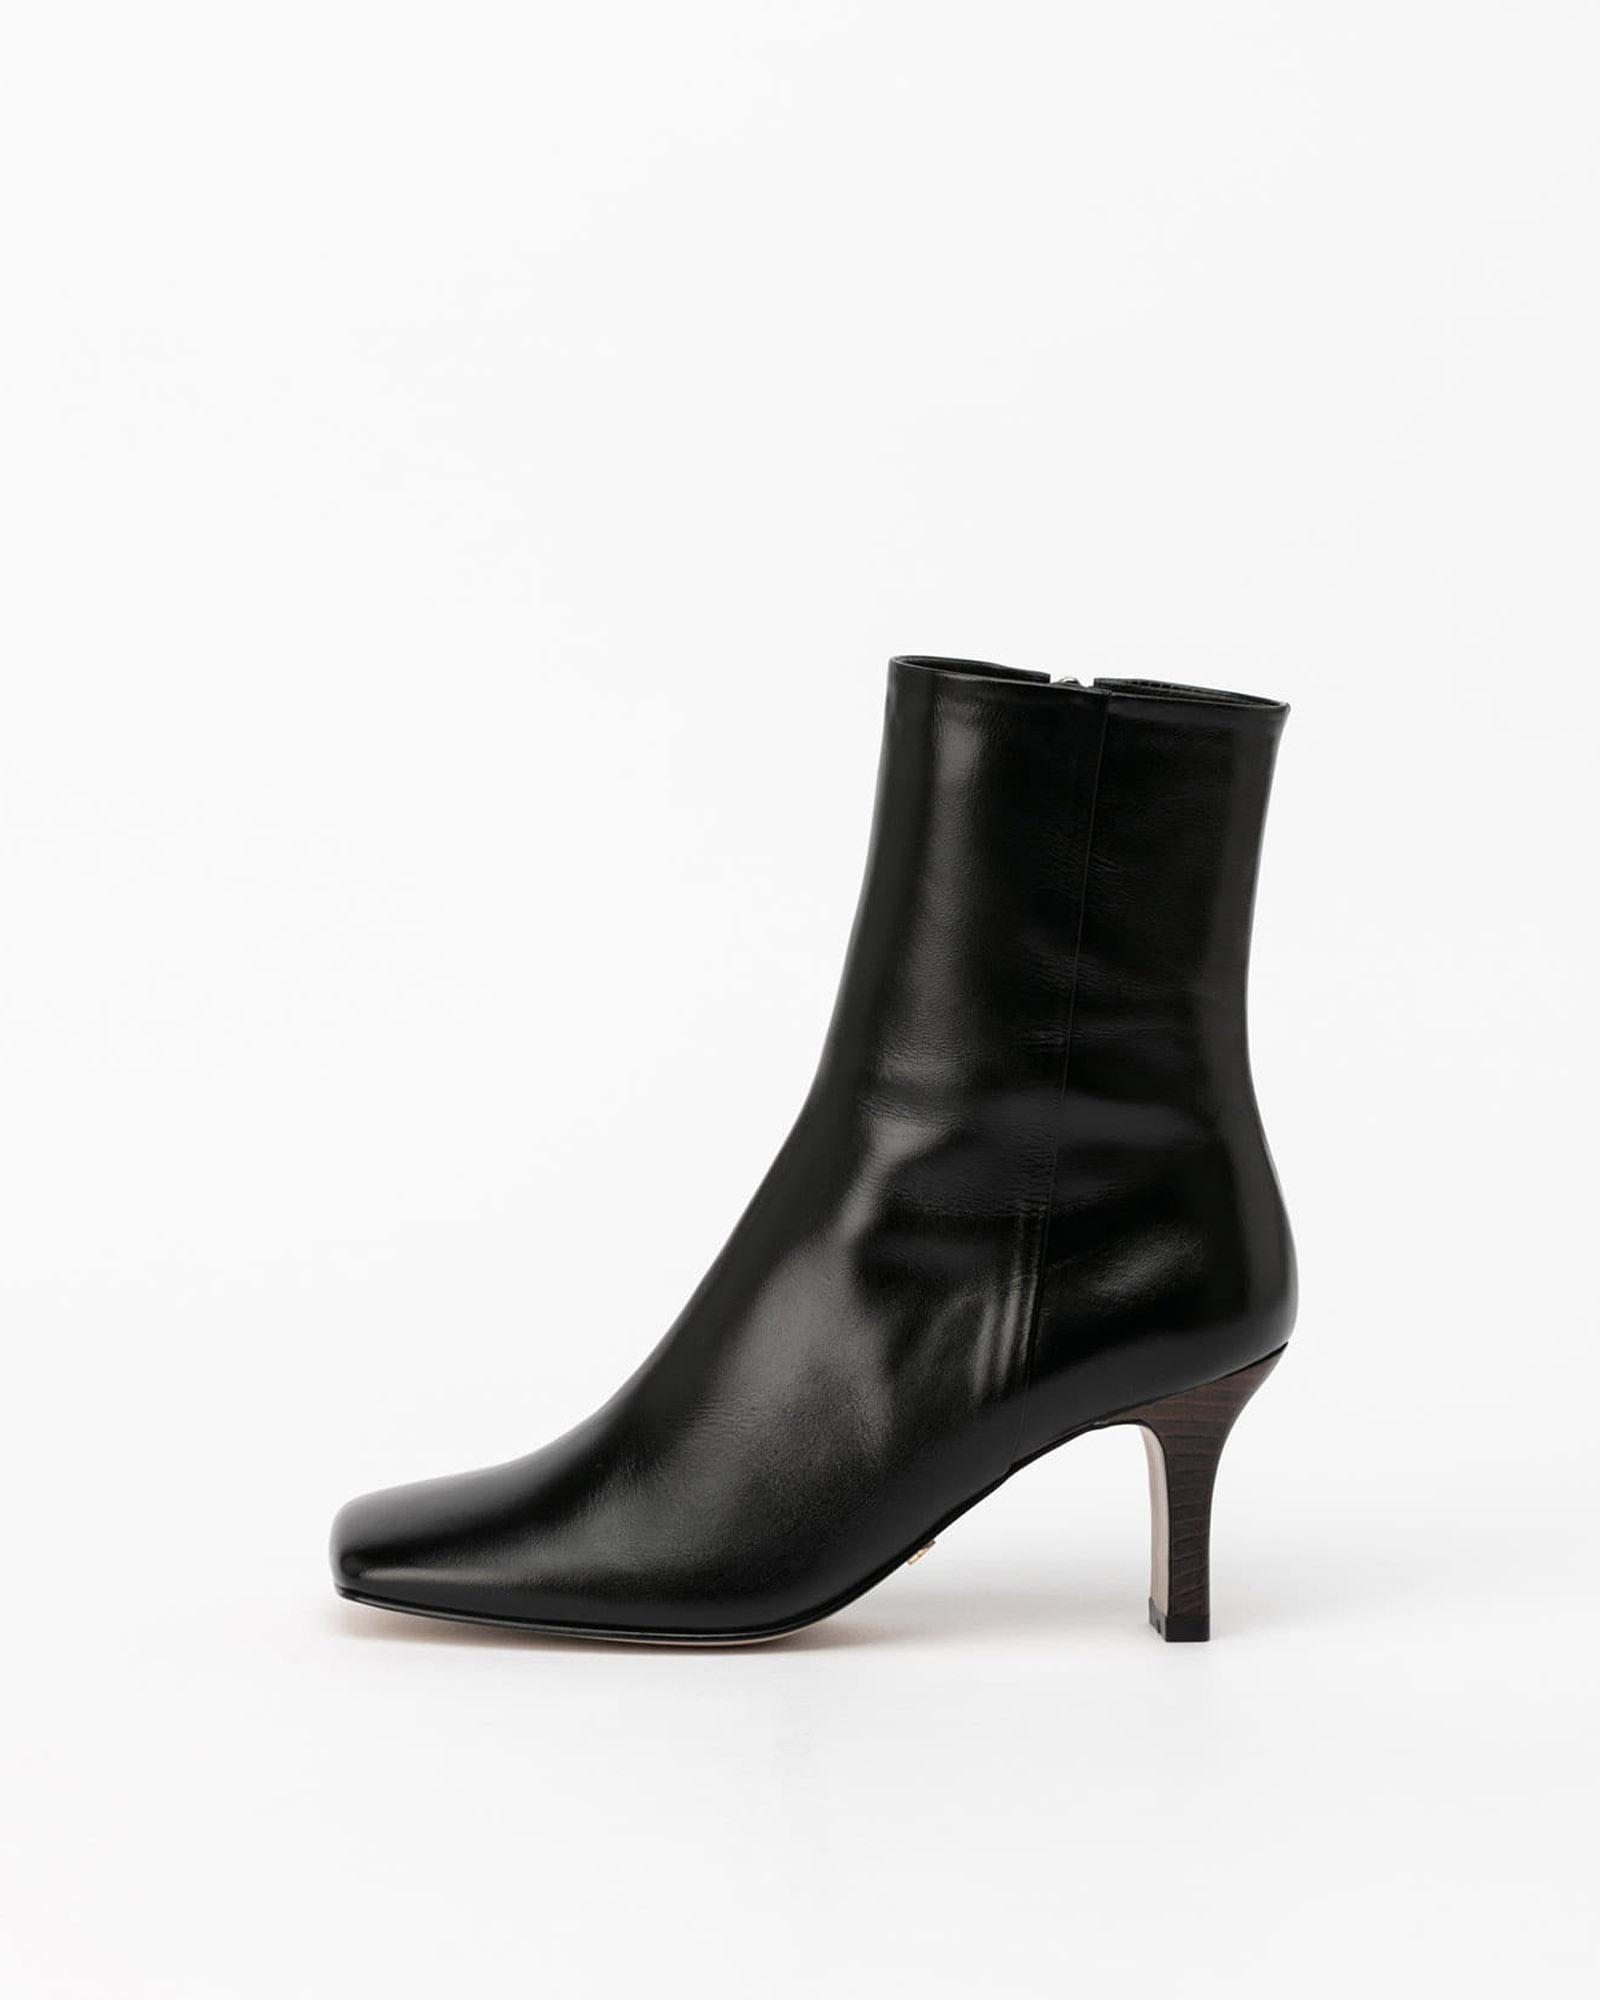 Lamon Boots in Textured Black